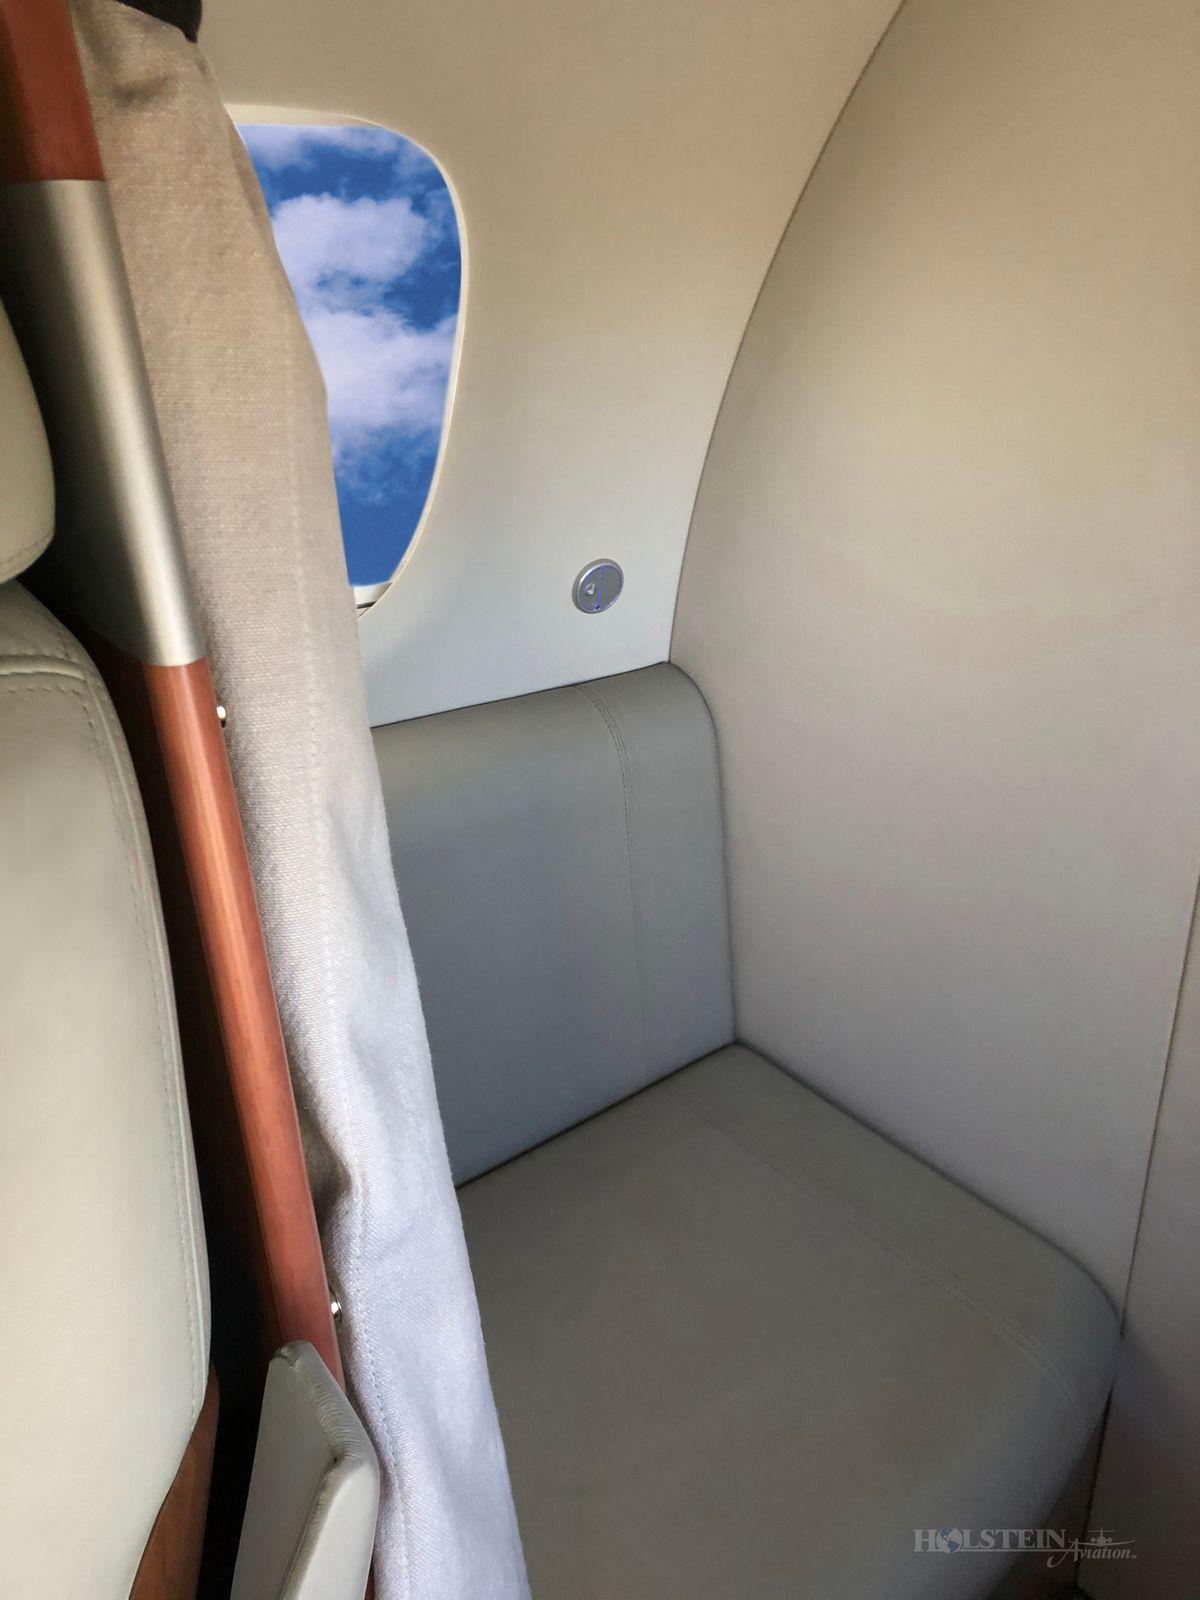 2011 Embraer Phenom 100 - 50000237 - N468ST - Int - Aft Seat RGB.jpg